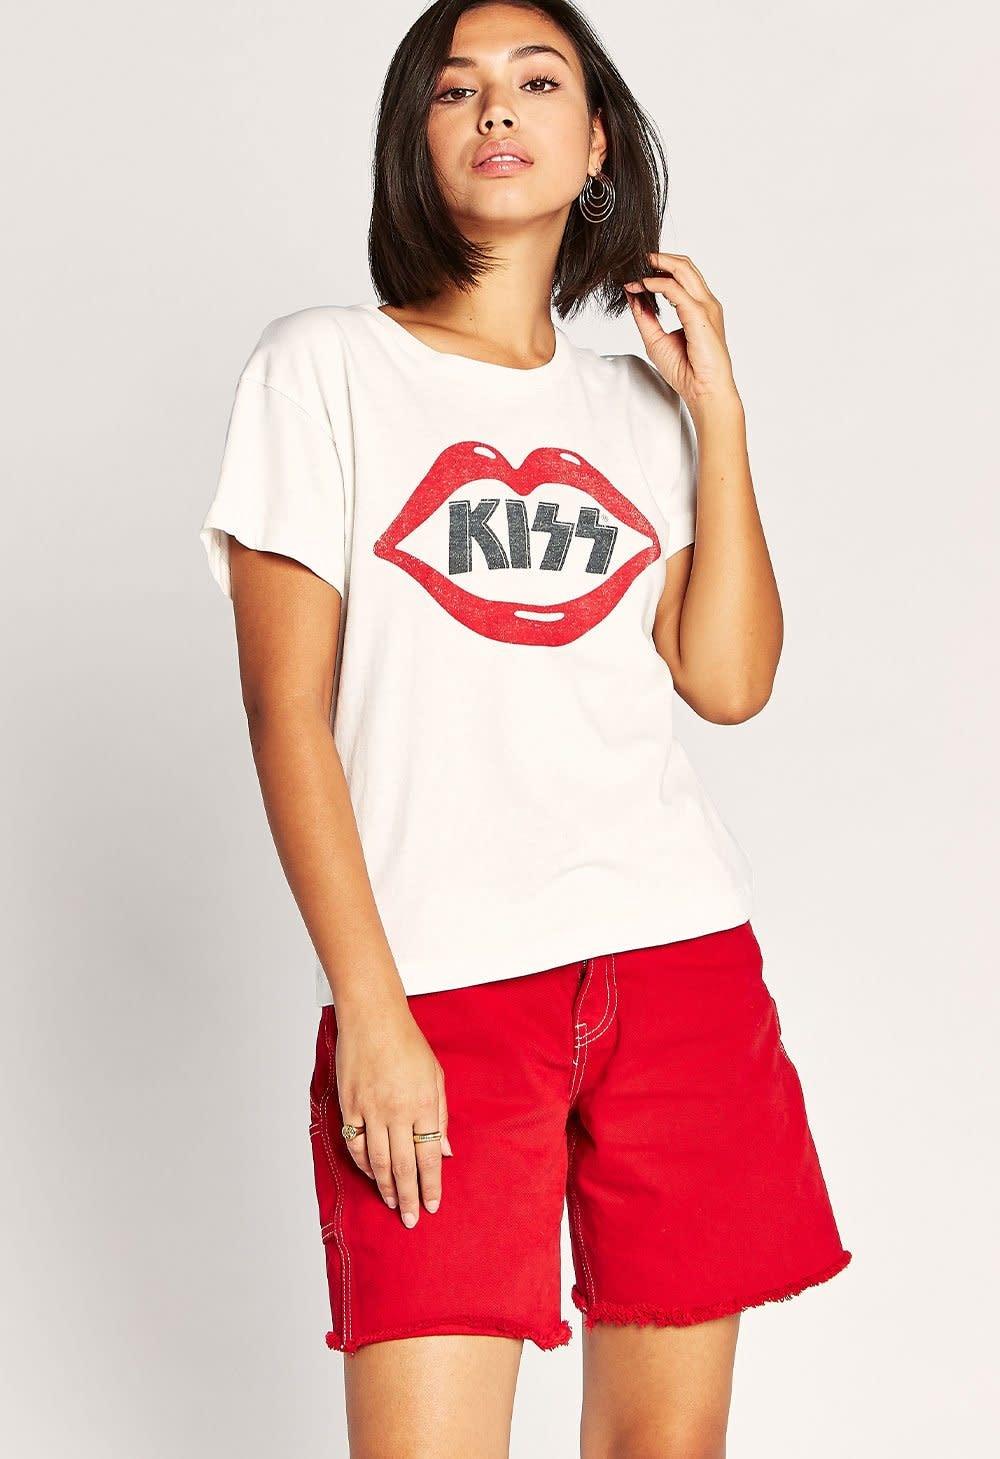 Daydreamer LA Kiss Lips Tour Tee